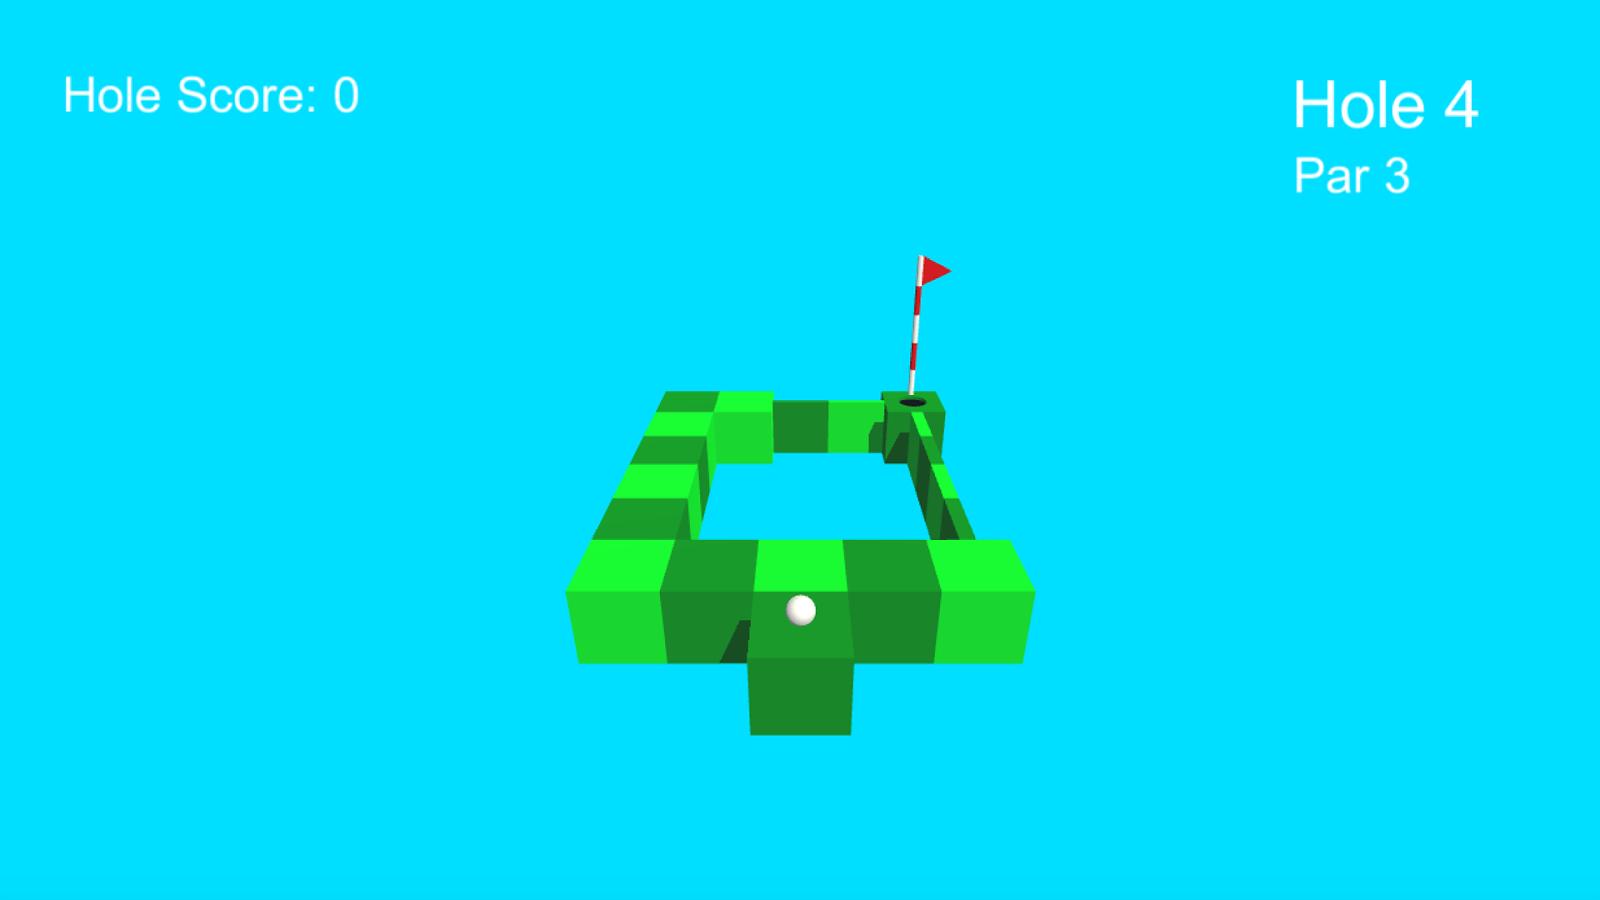 TipTap-Golf 21